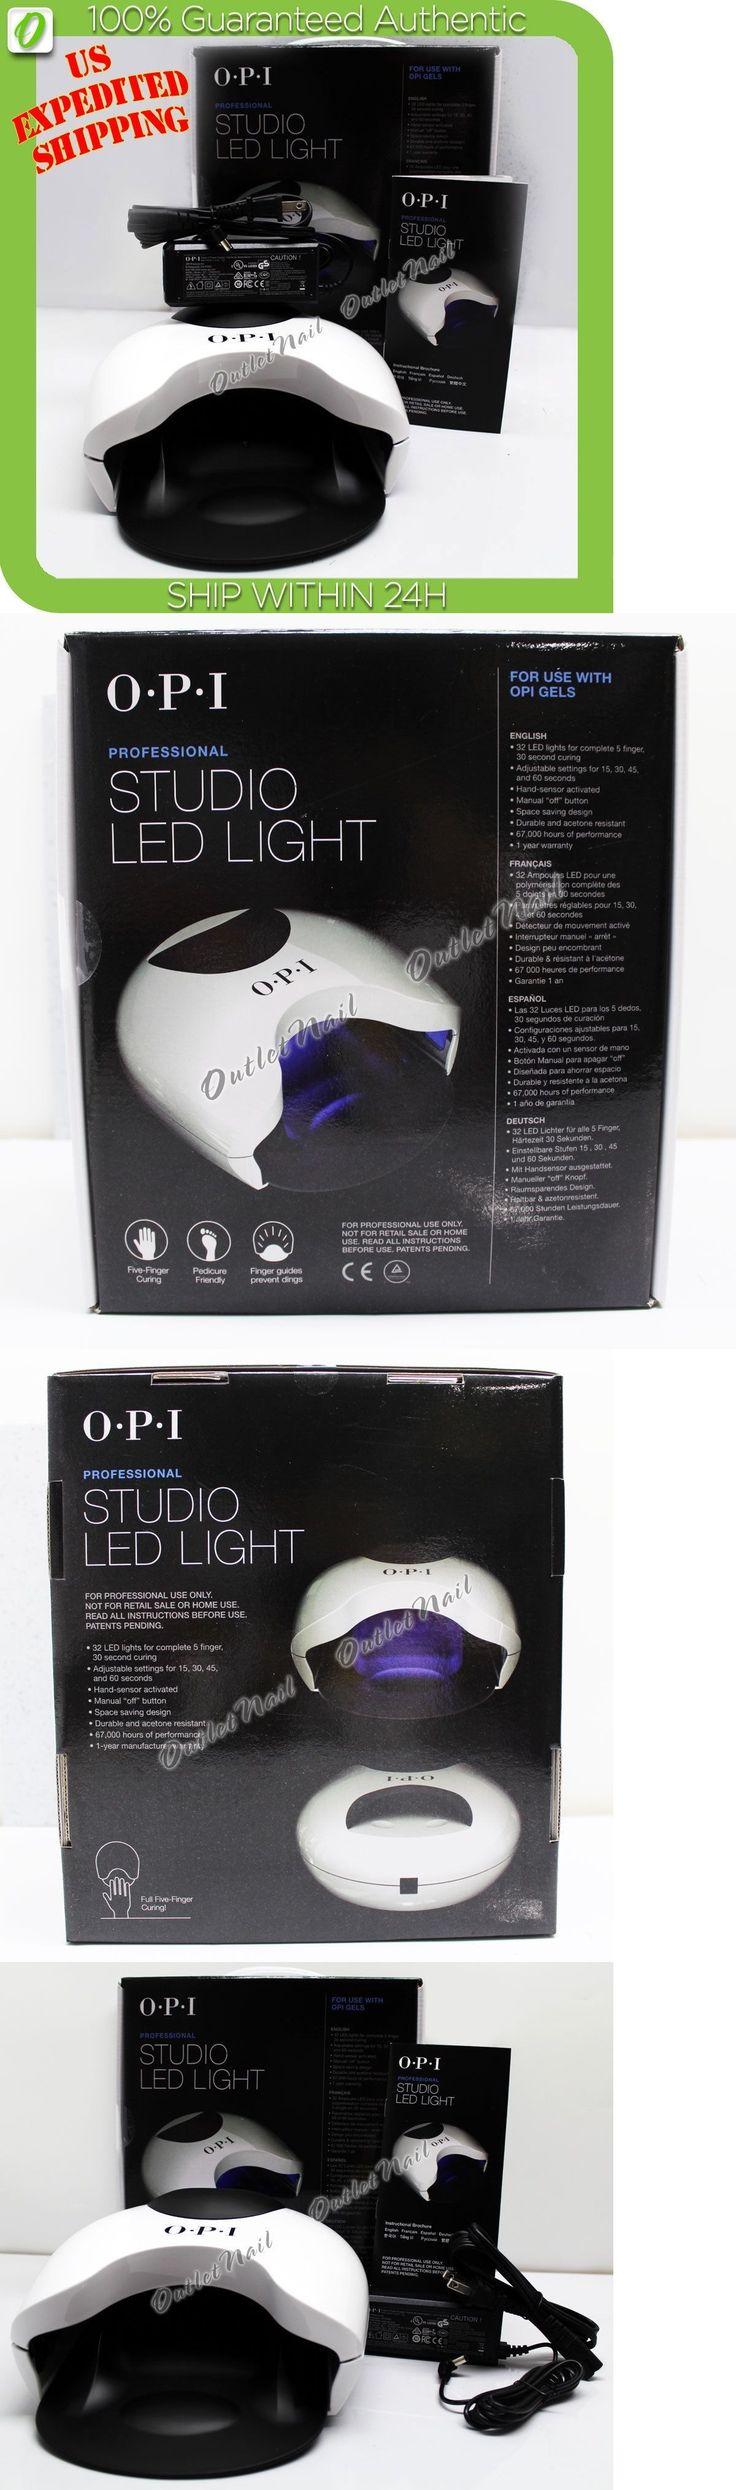 Nail Dryers and UV LED Lamps: Opi Studio Led Light Gl900 Lamp Gel Nail Polish Dryer 110V- 240V Uk, Au, Eu -> BUY IT NOW ONLY: $92.98 on eBay!